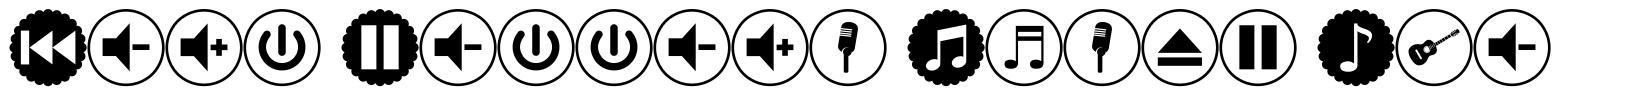 Font Bottons Music Pro font